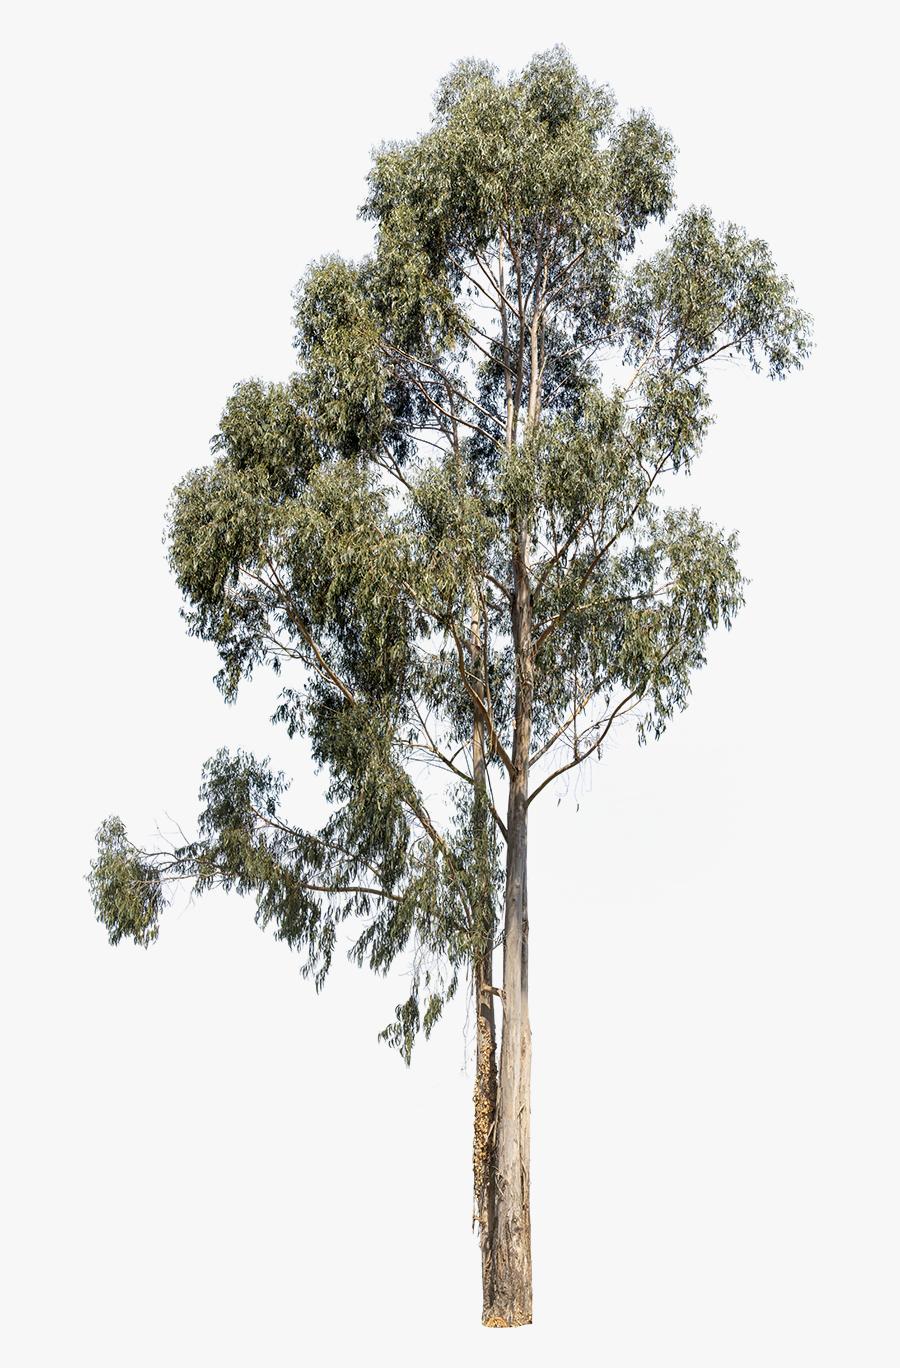 Transparent Kumquat Clipart - Eucalyptus Tree Cutout, Transparent Clipart